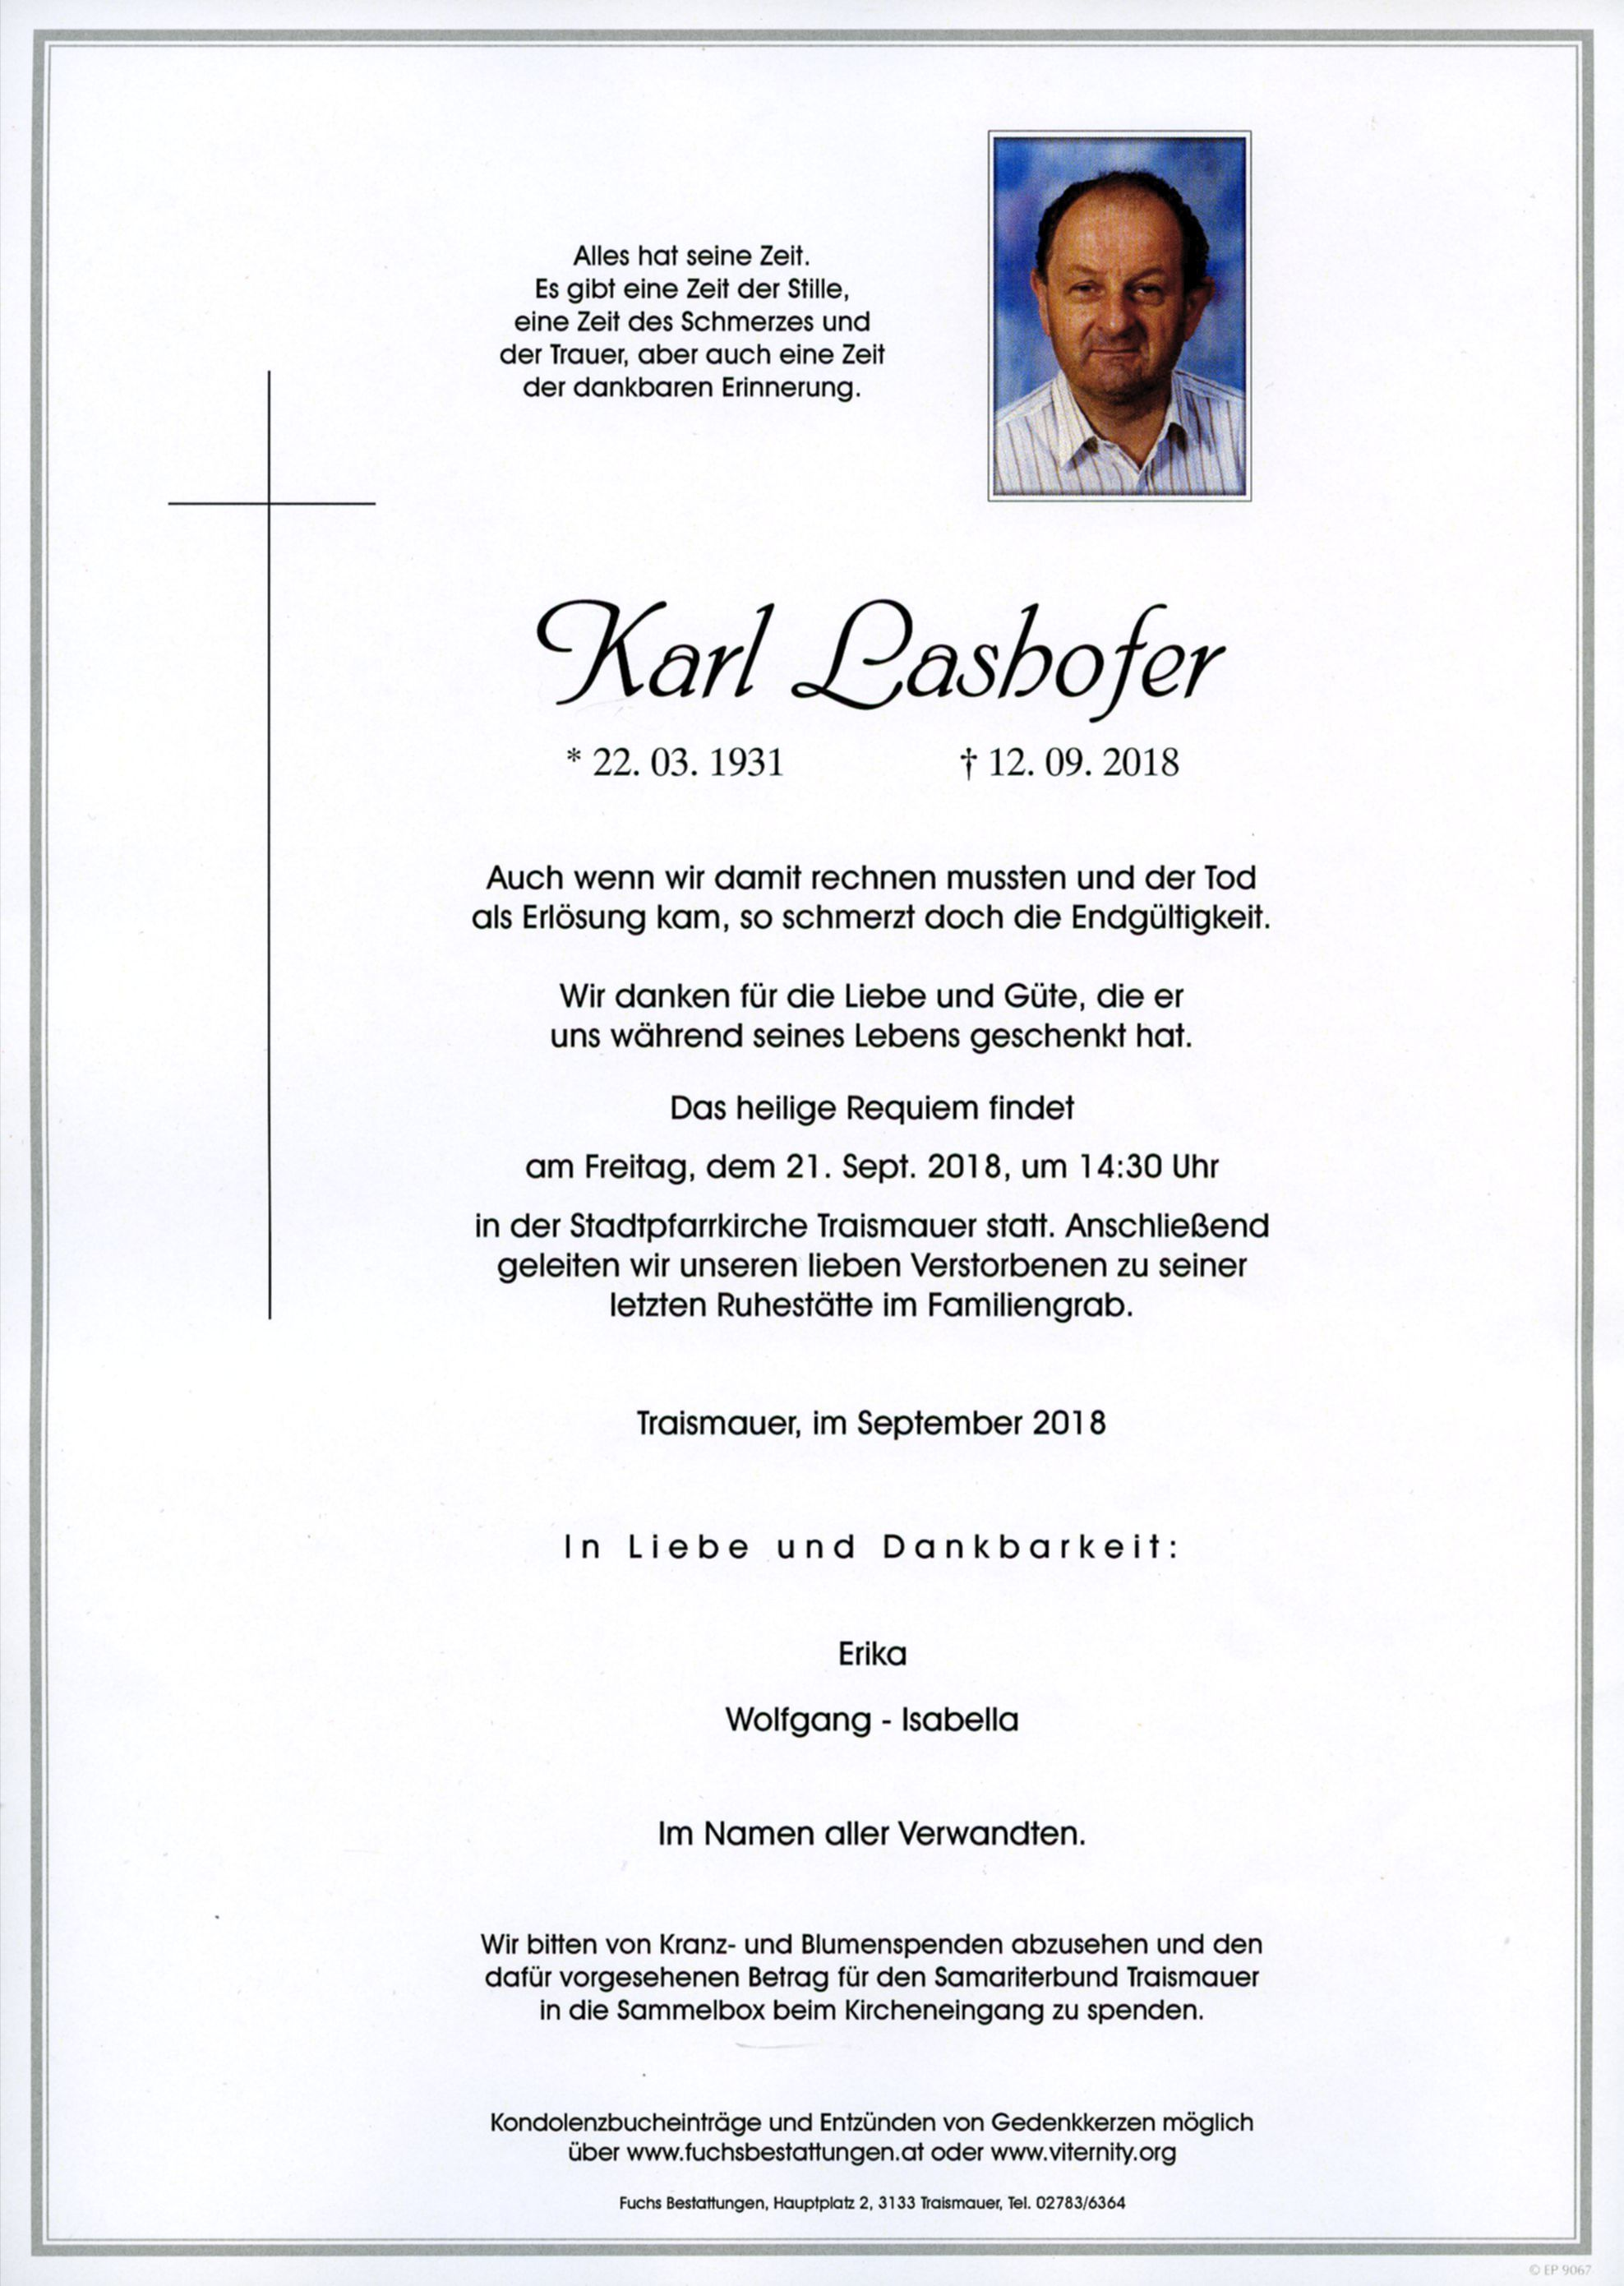 09 Parte Lashofer Karl424